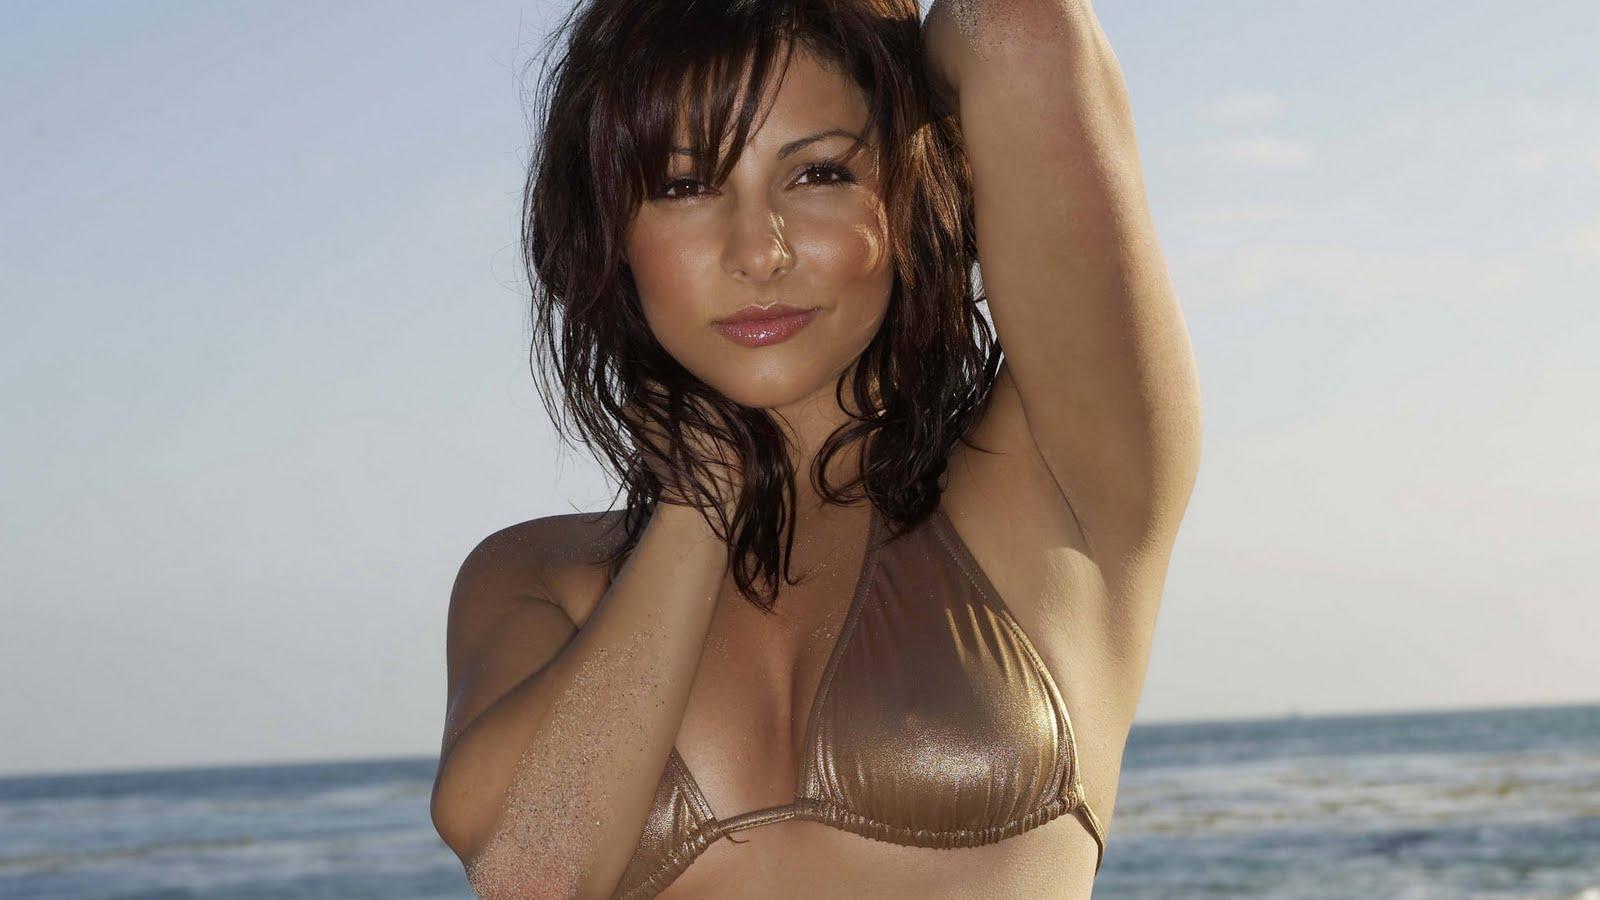 http://2.bp.blogspot.com/-HPU_PivOfvk/Te3UaZyPF5I/AAAAAAAAKlc/5dVJ5PuIhig/s1600/top-10-bikini-model-wallpaper+%25281%2529.JPG